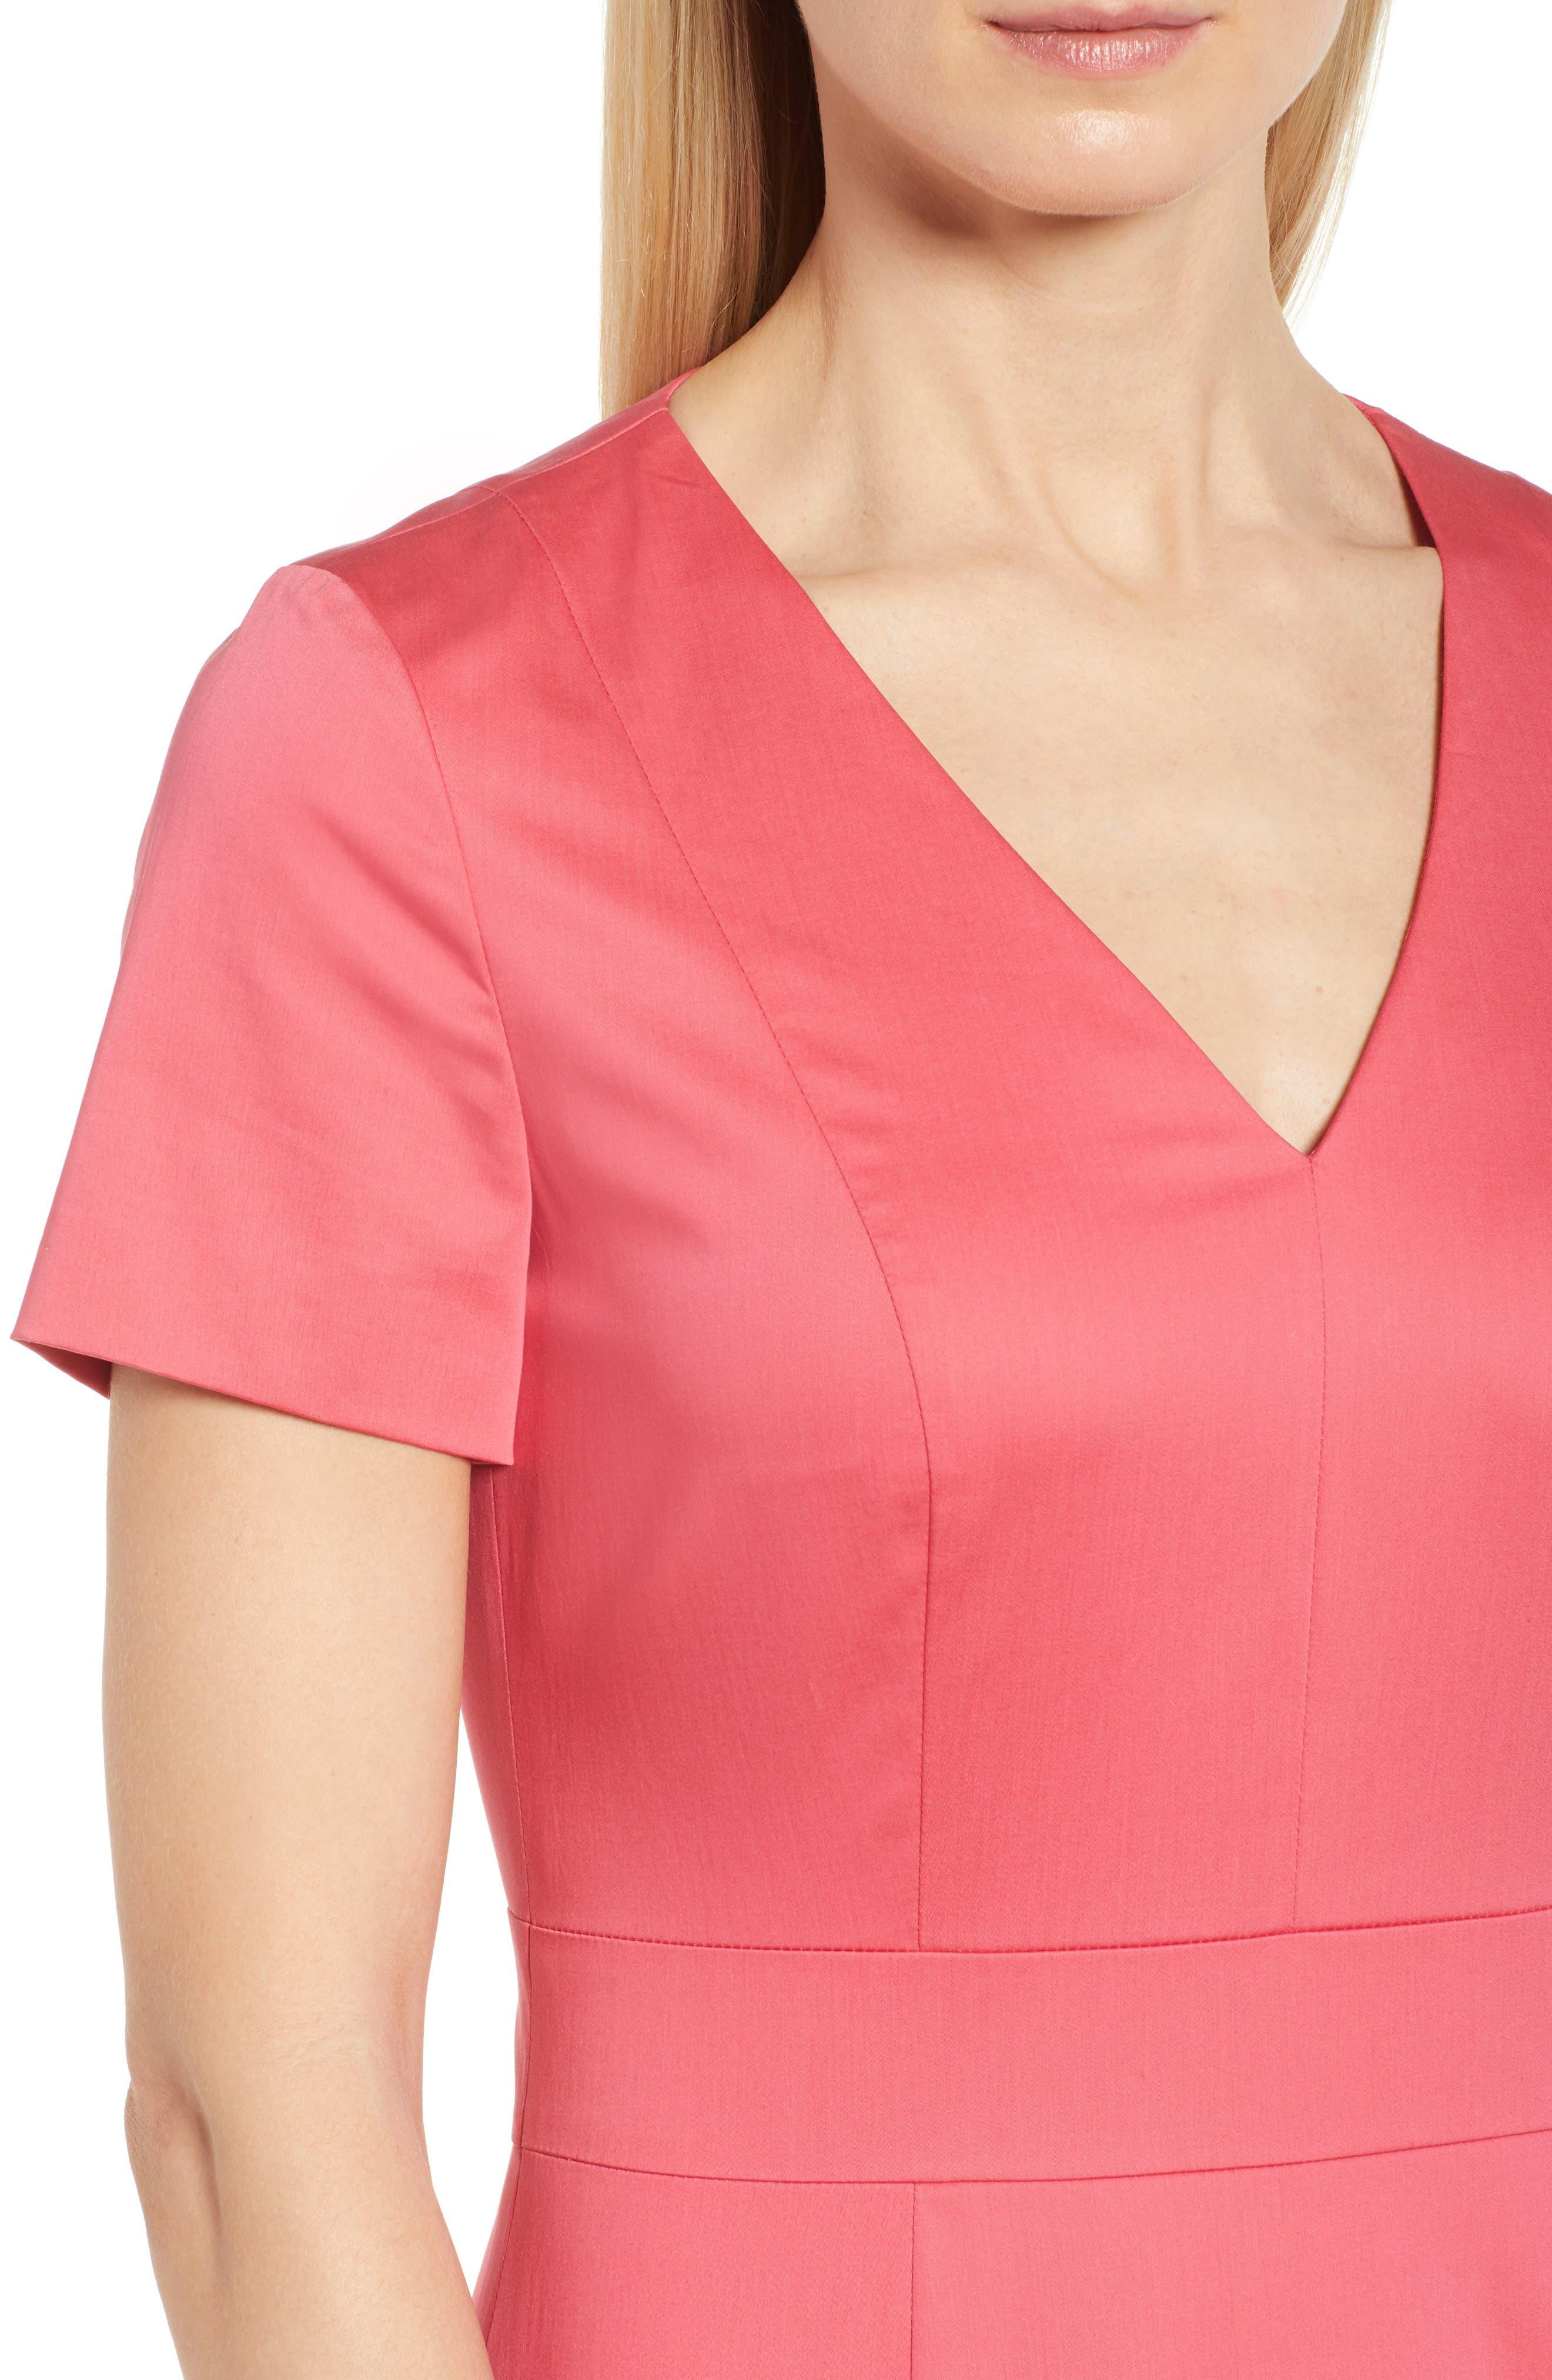 Dasali V-Neck Sheath Dress,                             Alternate thumbnail 4, color,                             Lychee Pink